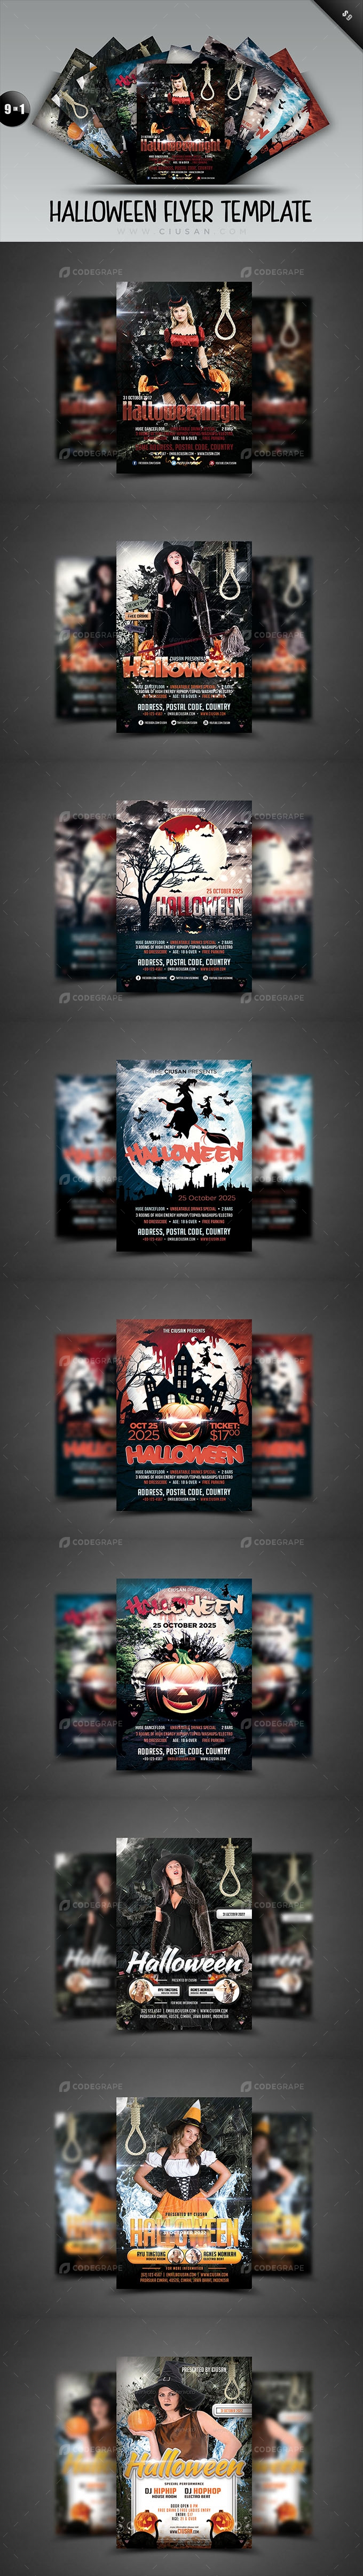 Halloween Flyer Template - Bundle